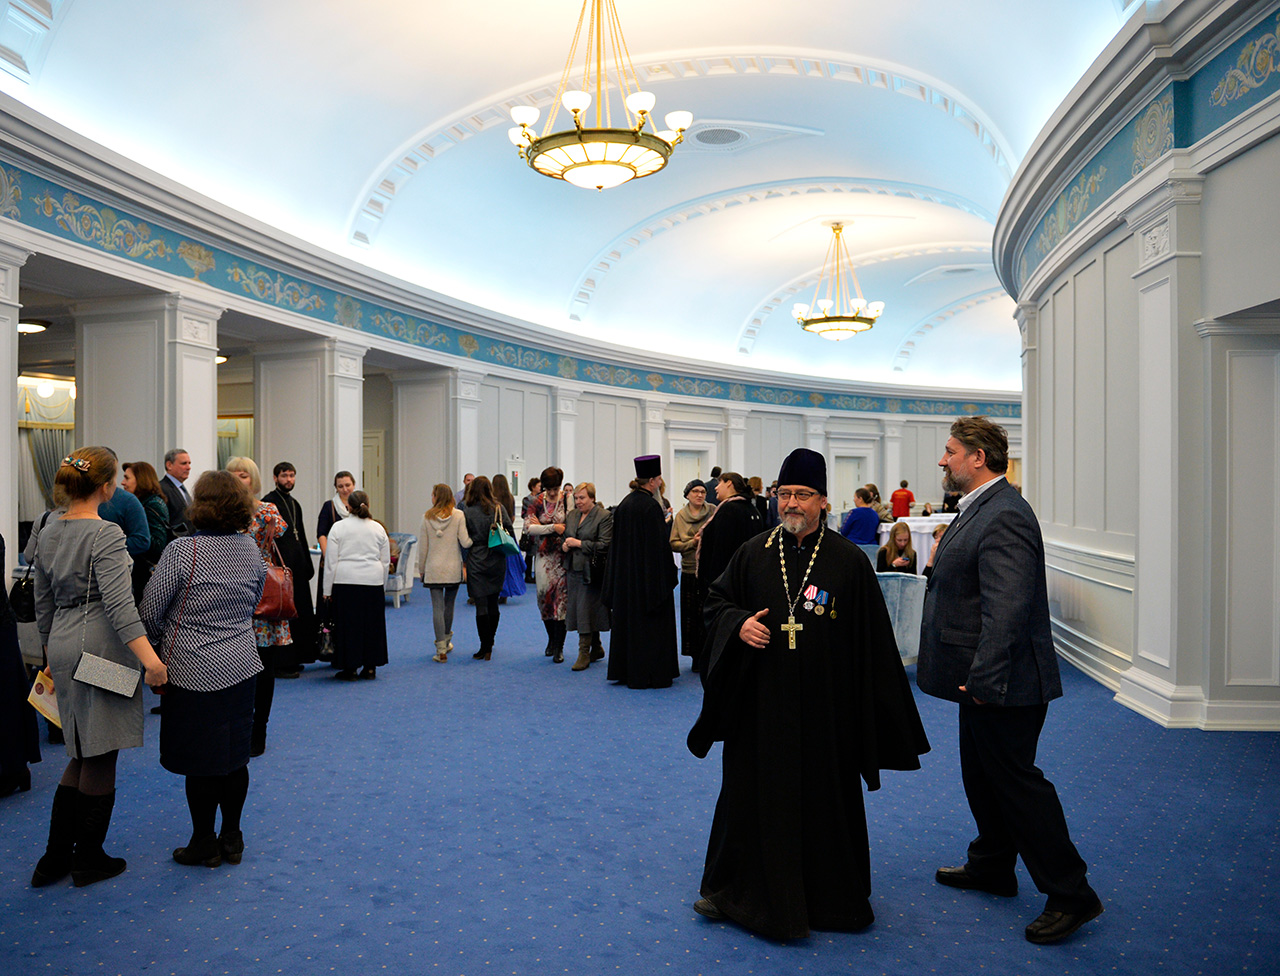 People at the Novosibirsk Theater of Opera and Ballet, Nov. 11, 2015. / Photo: Alexandr Kryazhev/RIA Novosti